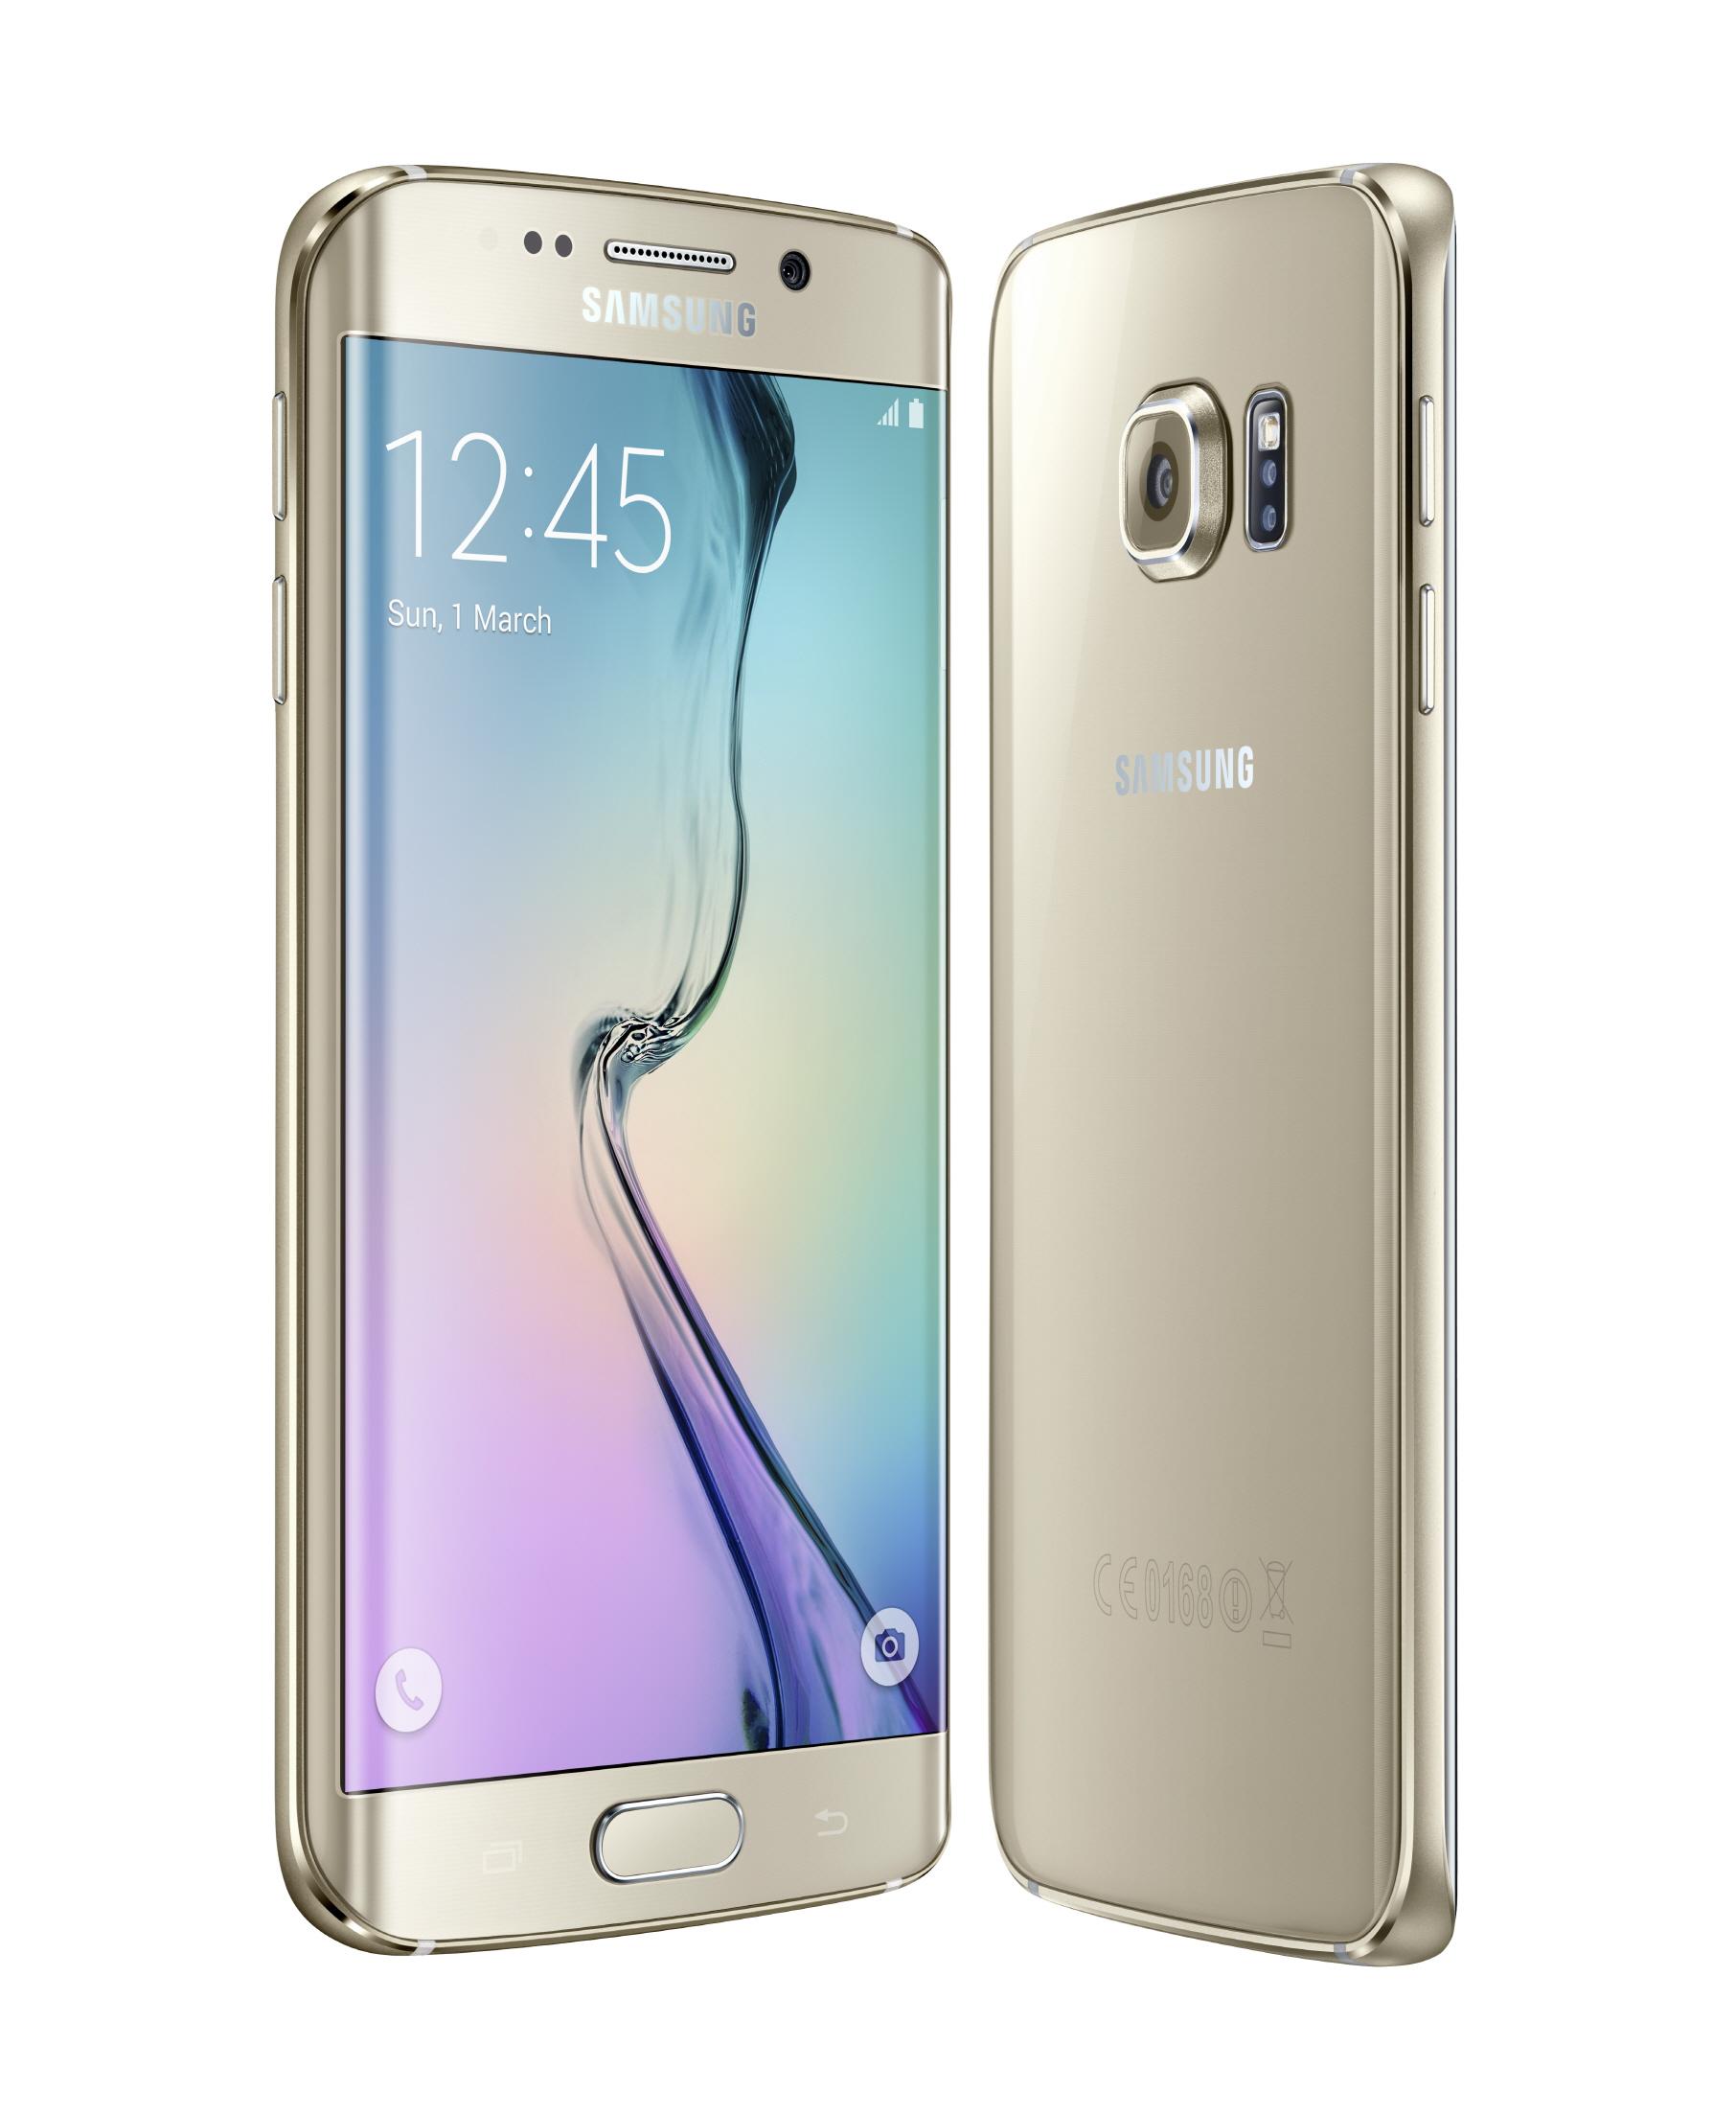 (SEMASA) Samsung Galaxy S6 and Galaxy S6 edge – the most ...